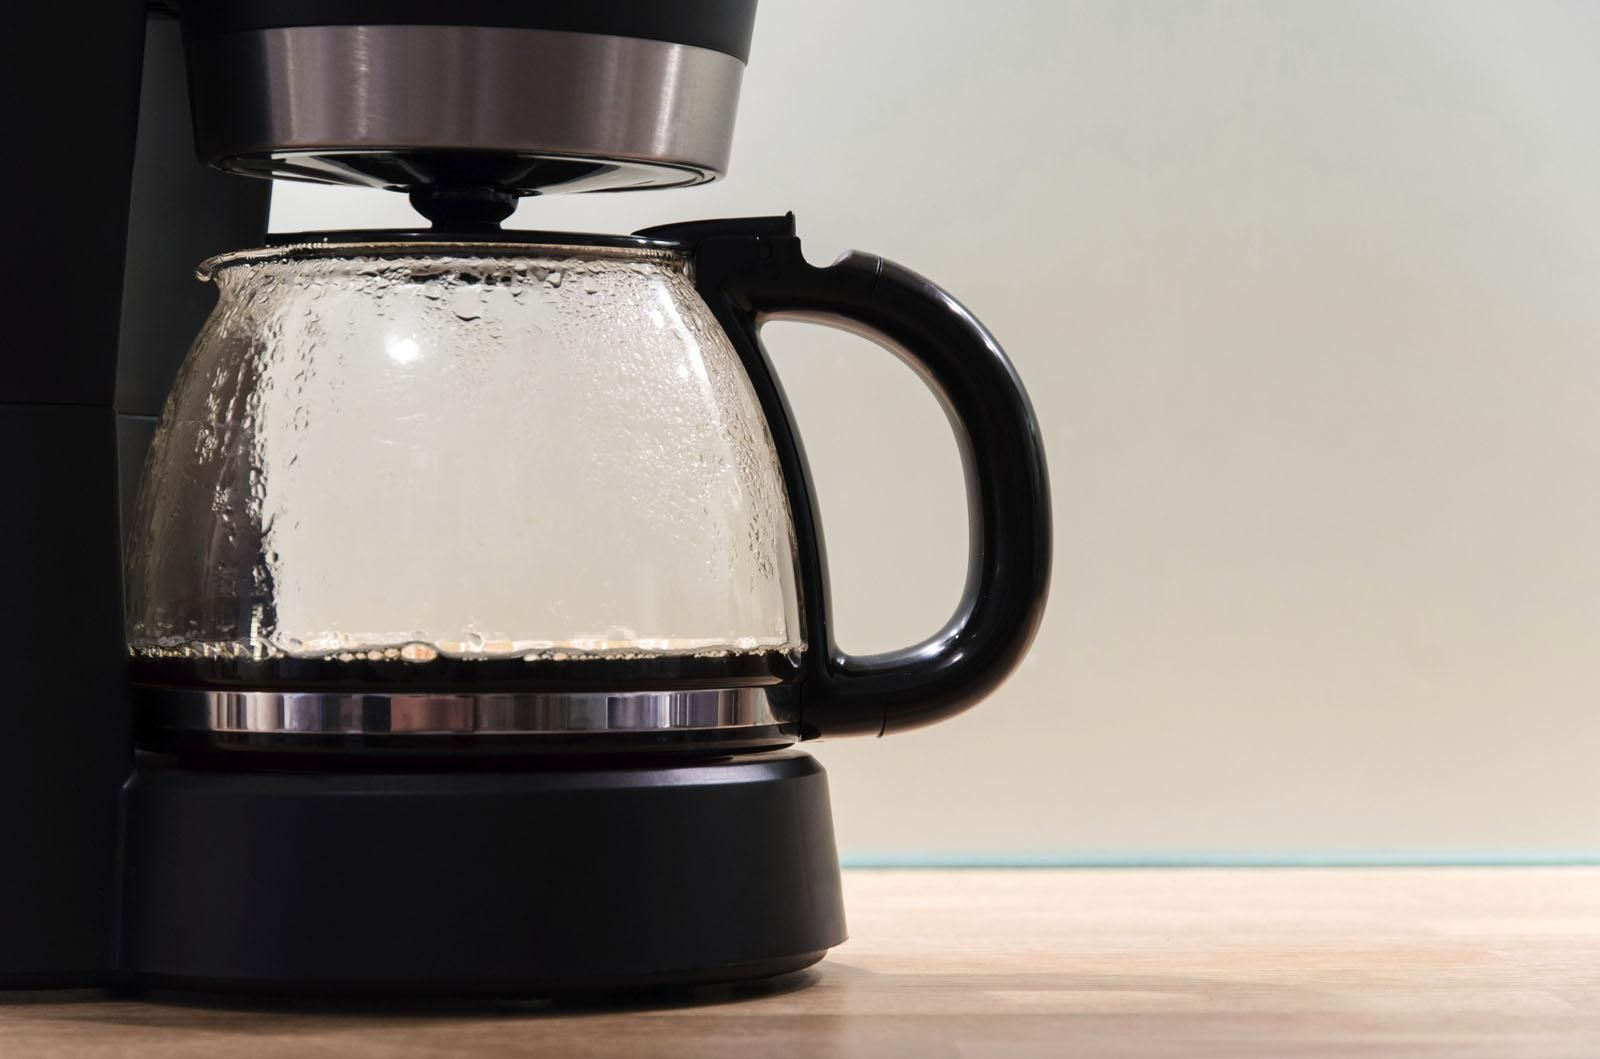 How Gross is Your Coffee Maker? | Fox News Magazine